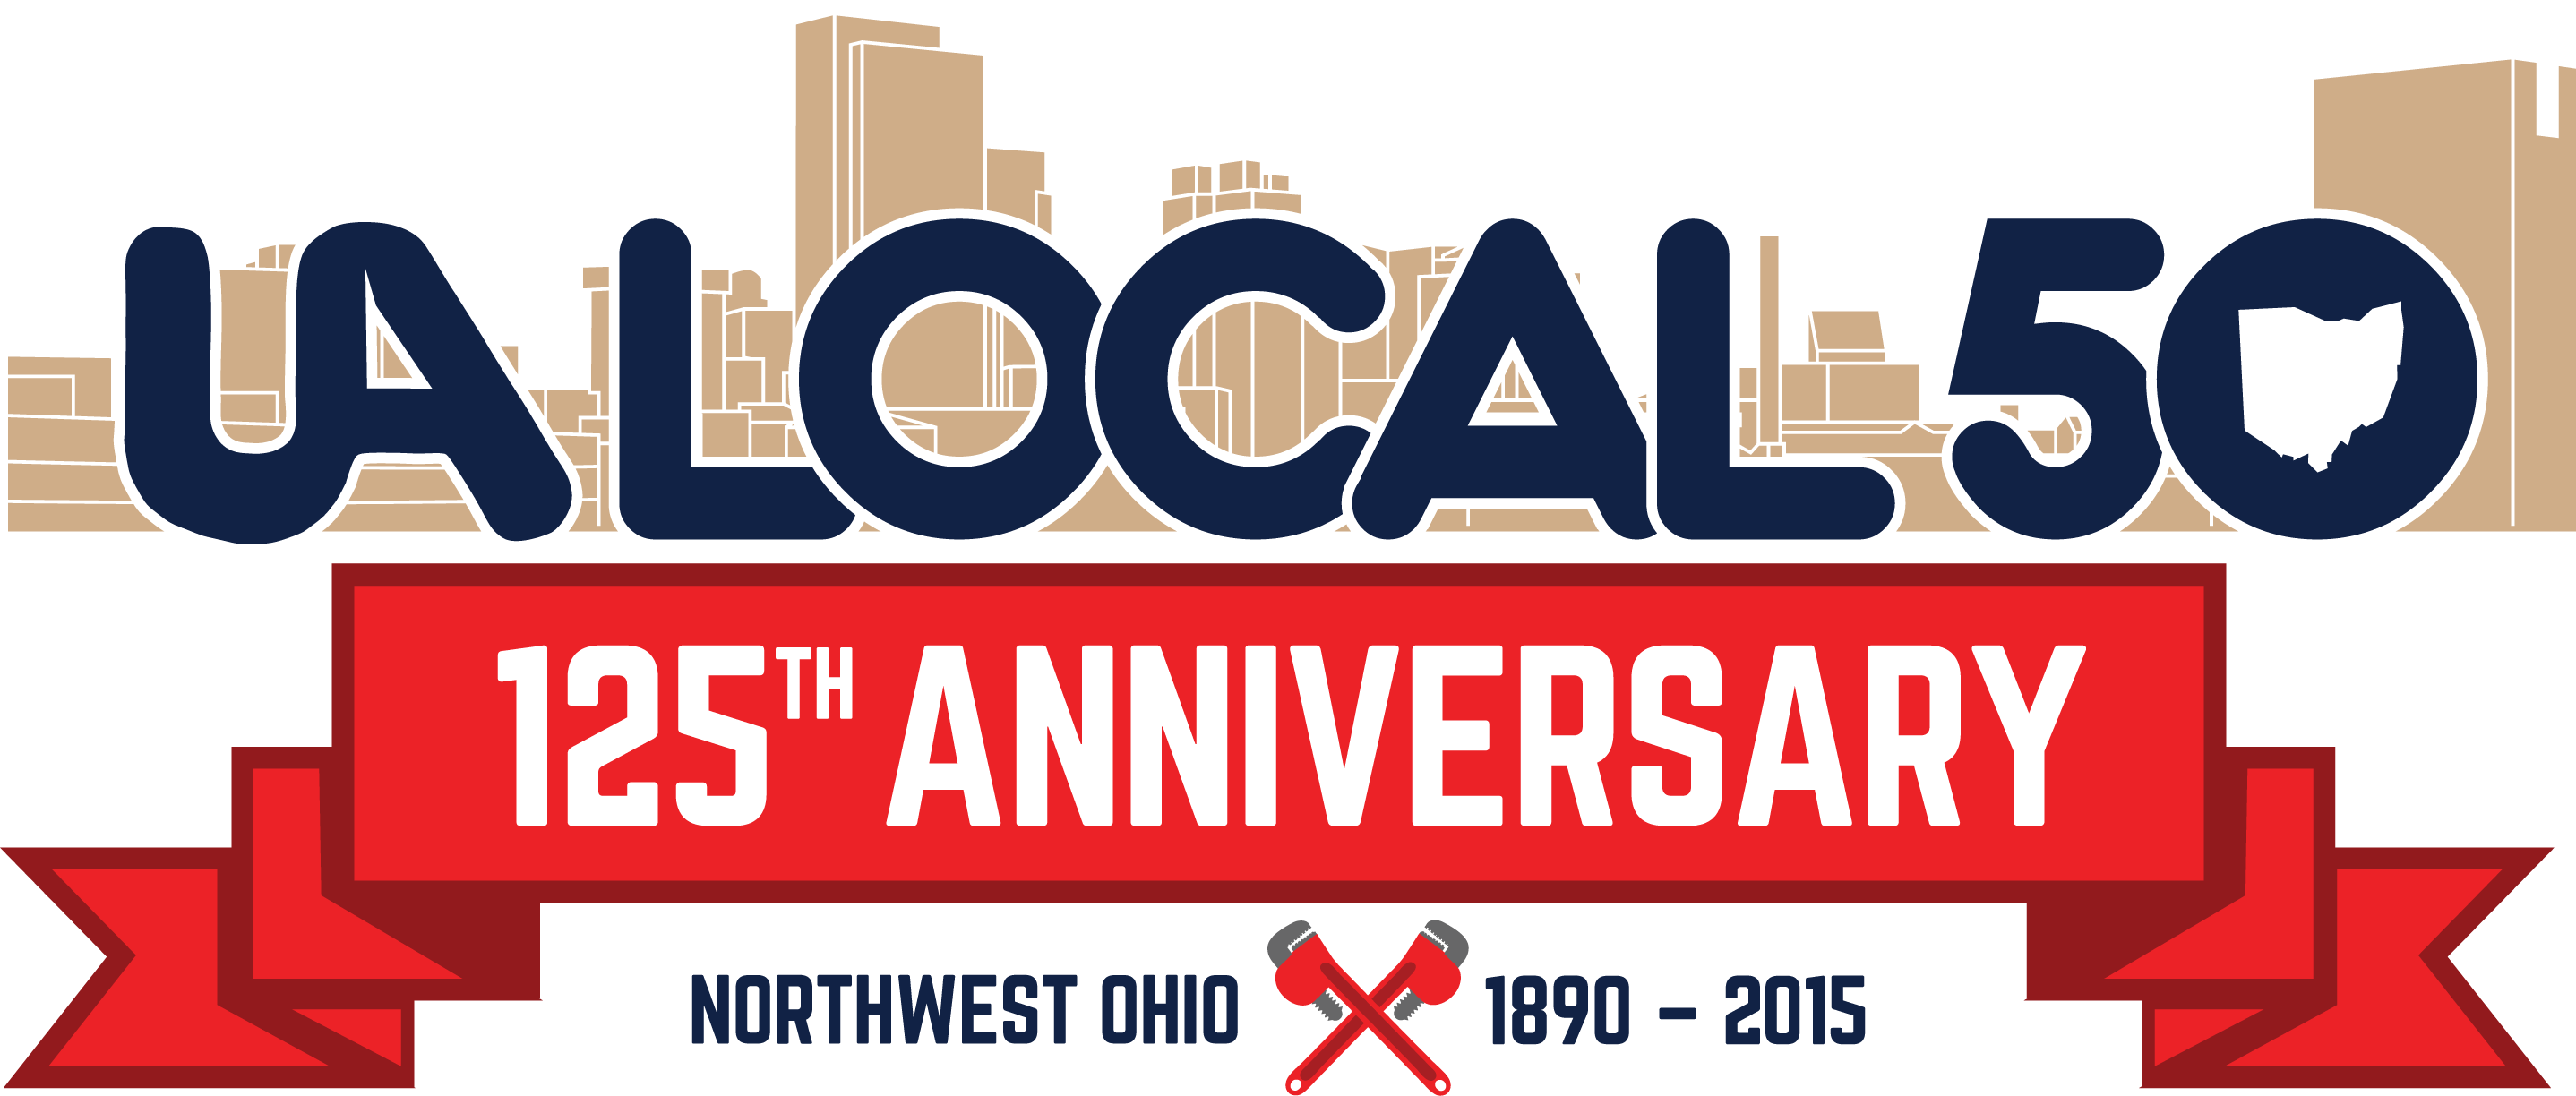 UA Local 50 125th Anniversary logo